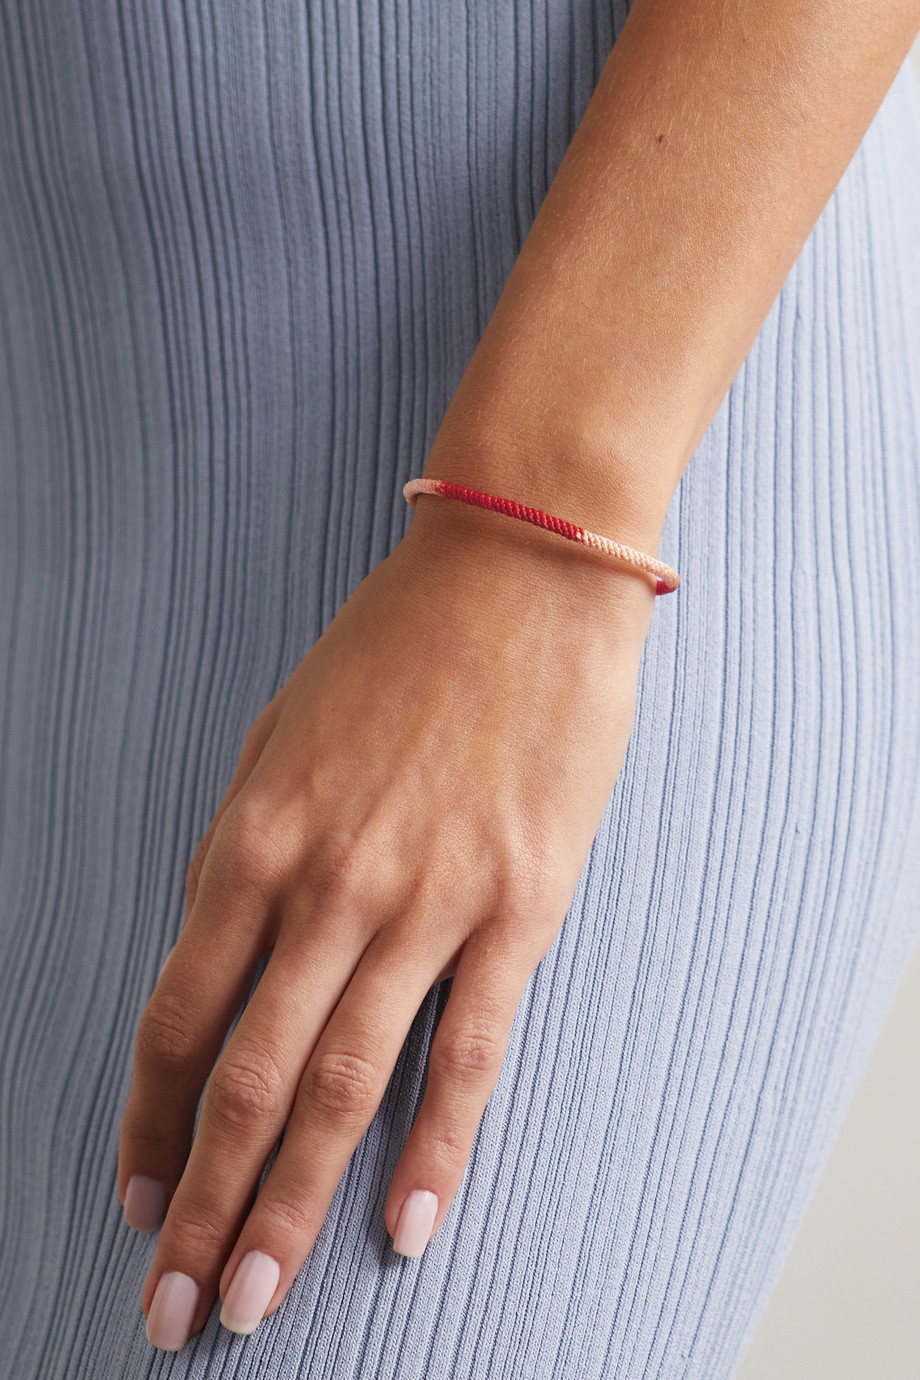 OLE LYNGGAARD COPENHAGEN Bracelet en or 18 carats (750/1000) et corde Life